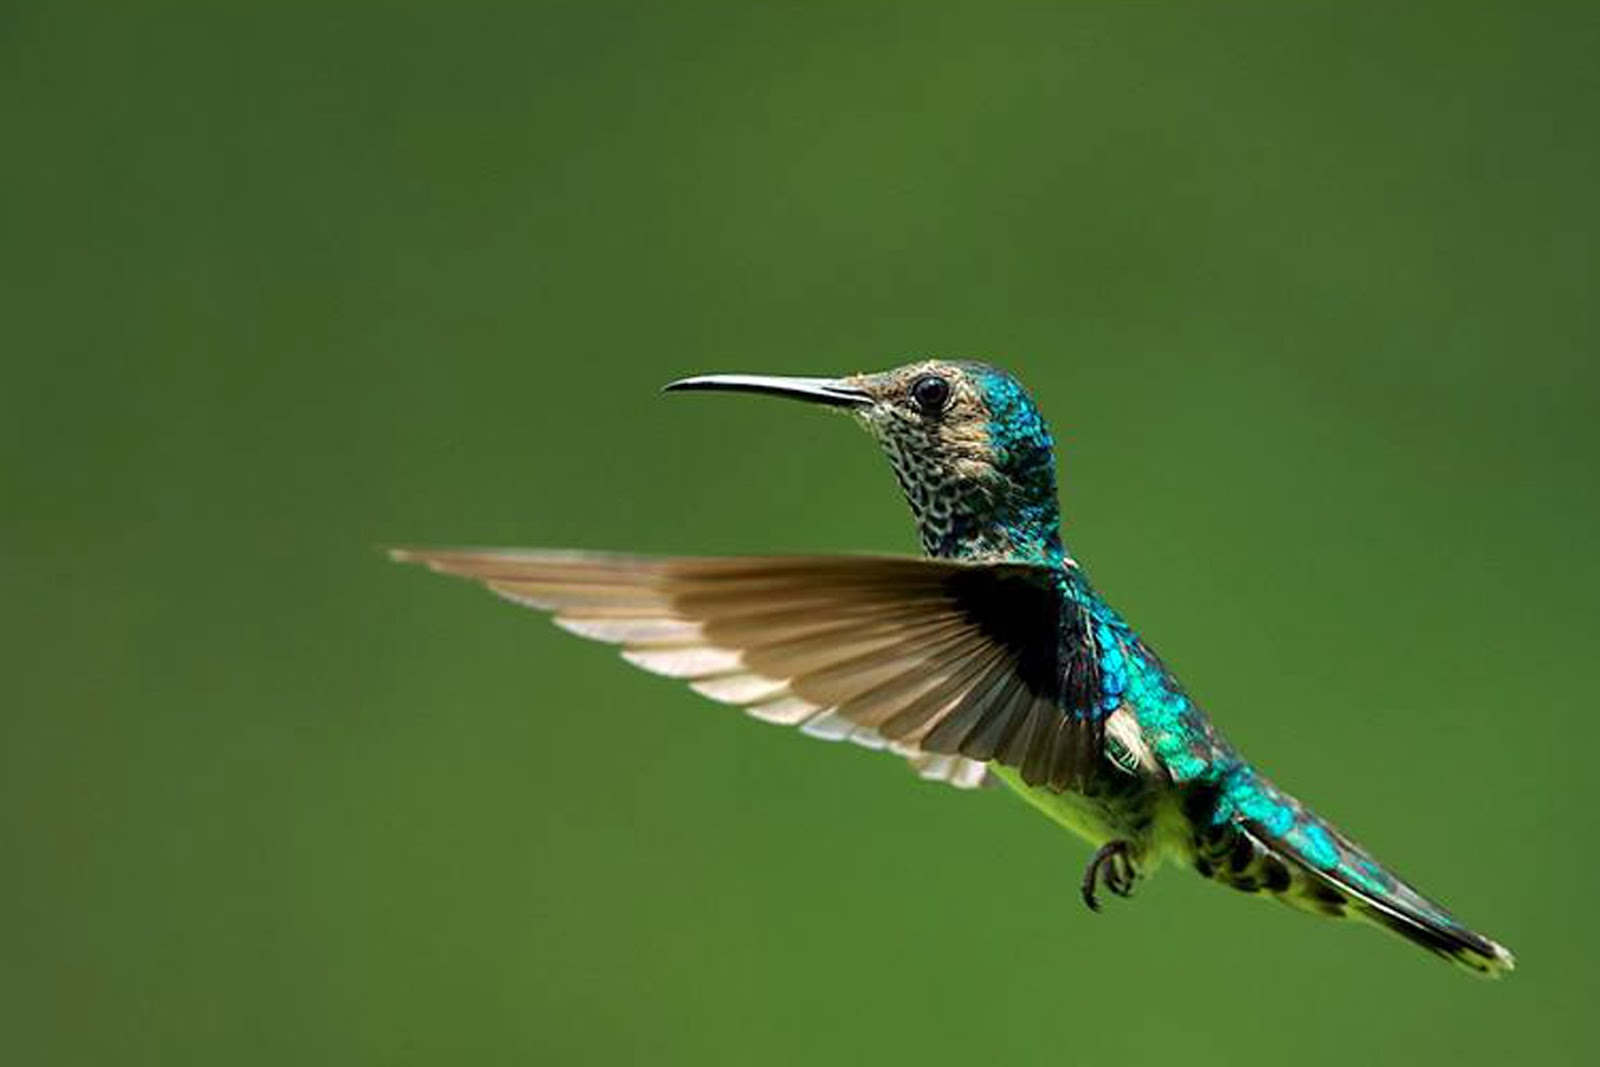 images of free hummingbird screensaver and wallpaper calto